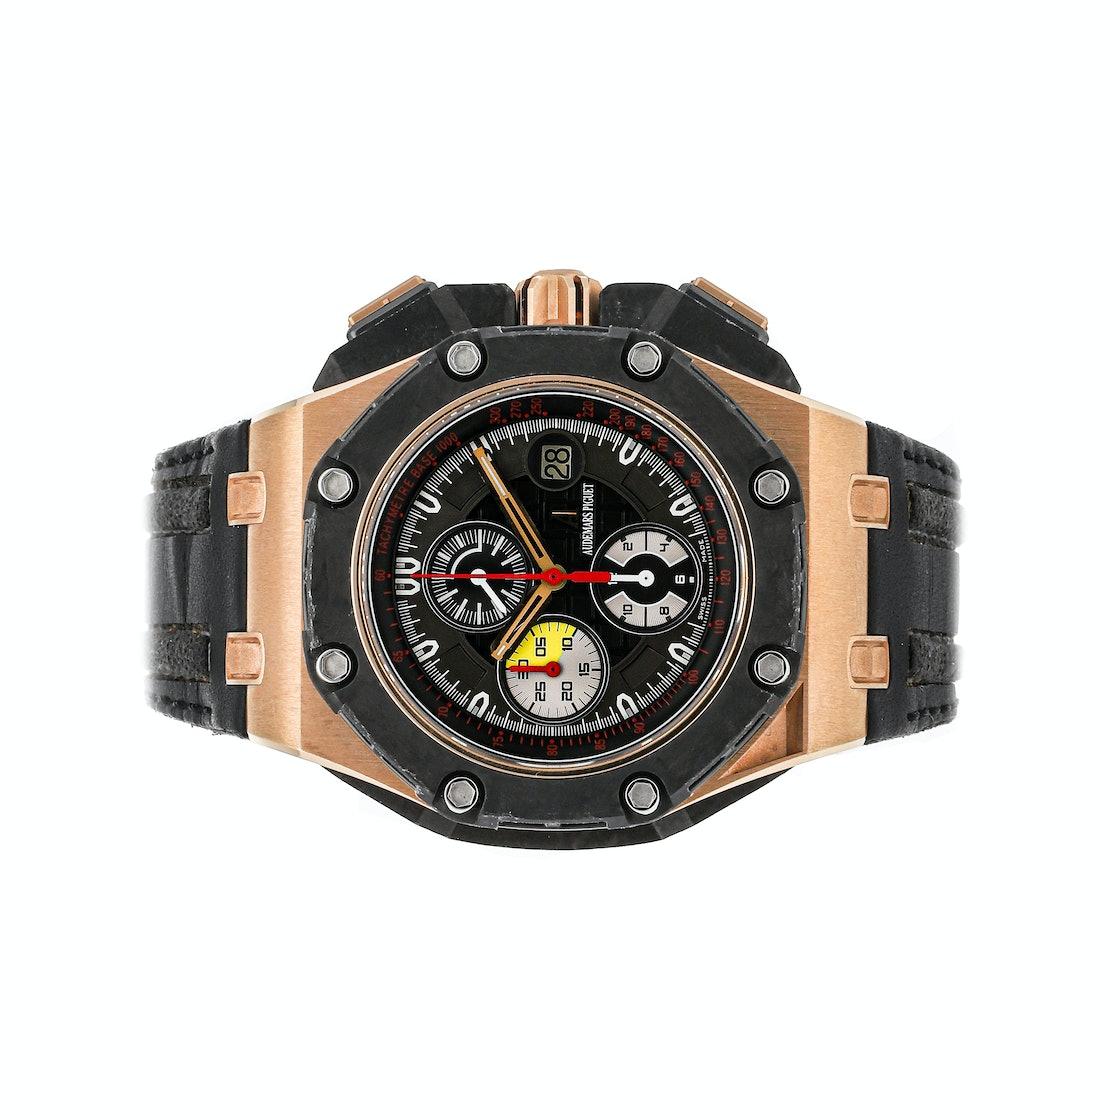 Audemars Piguet Royal Oak Offshore Grand Prix Chronograph Limited Edition 26290RO.OO.A001VE.01